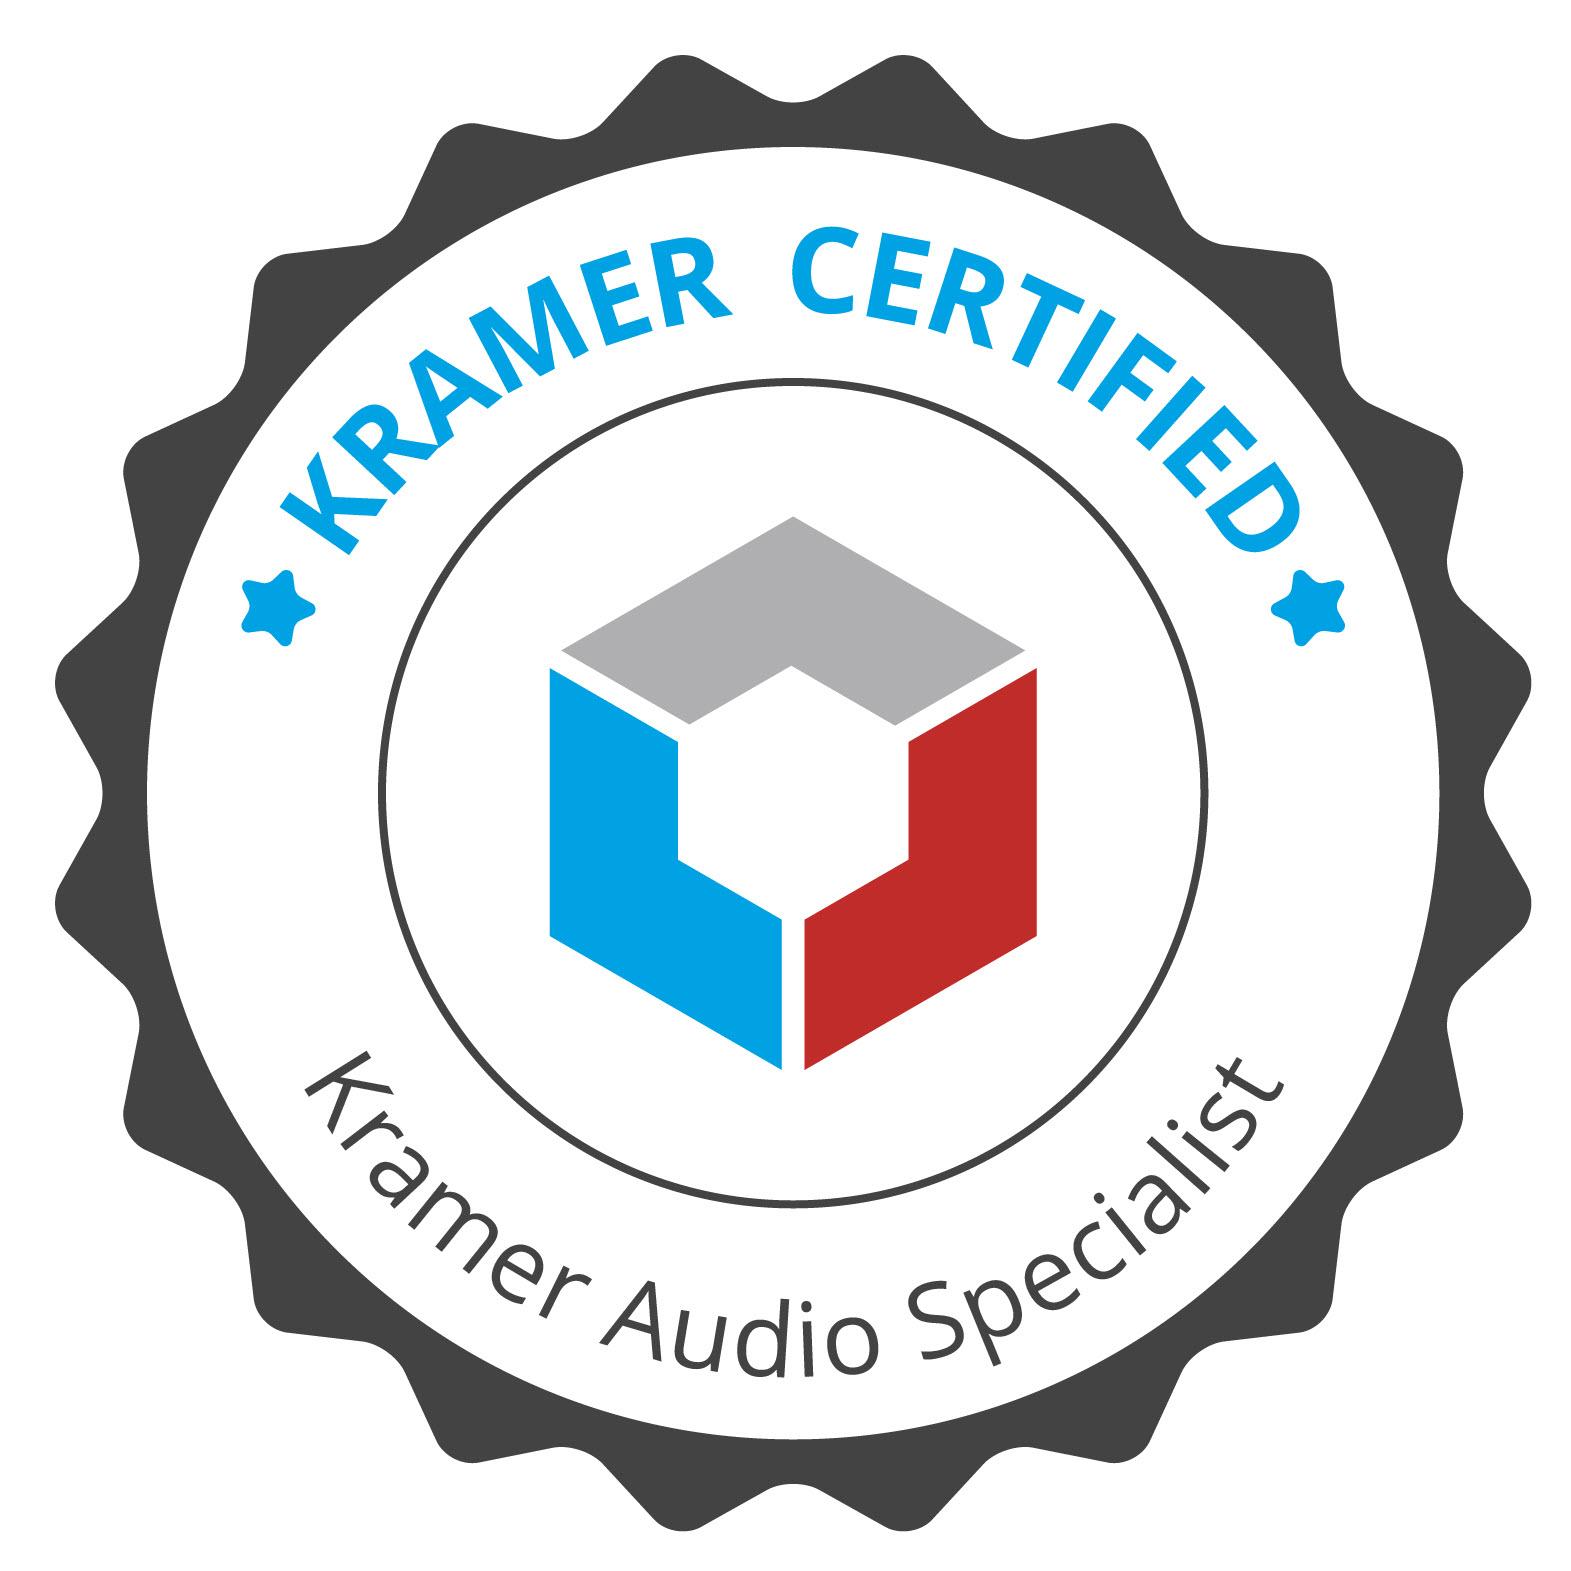 Digital Audio Basics 101: Basic concepts